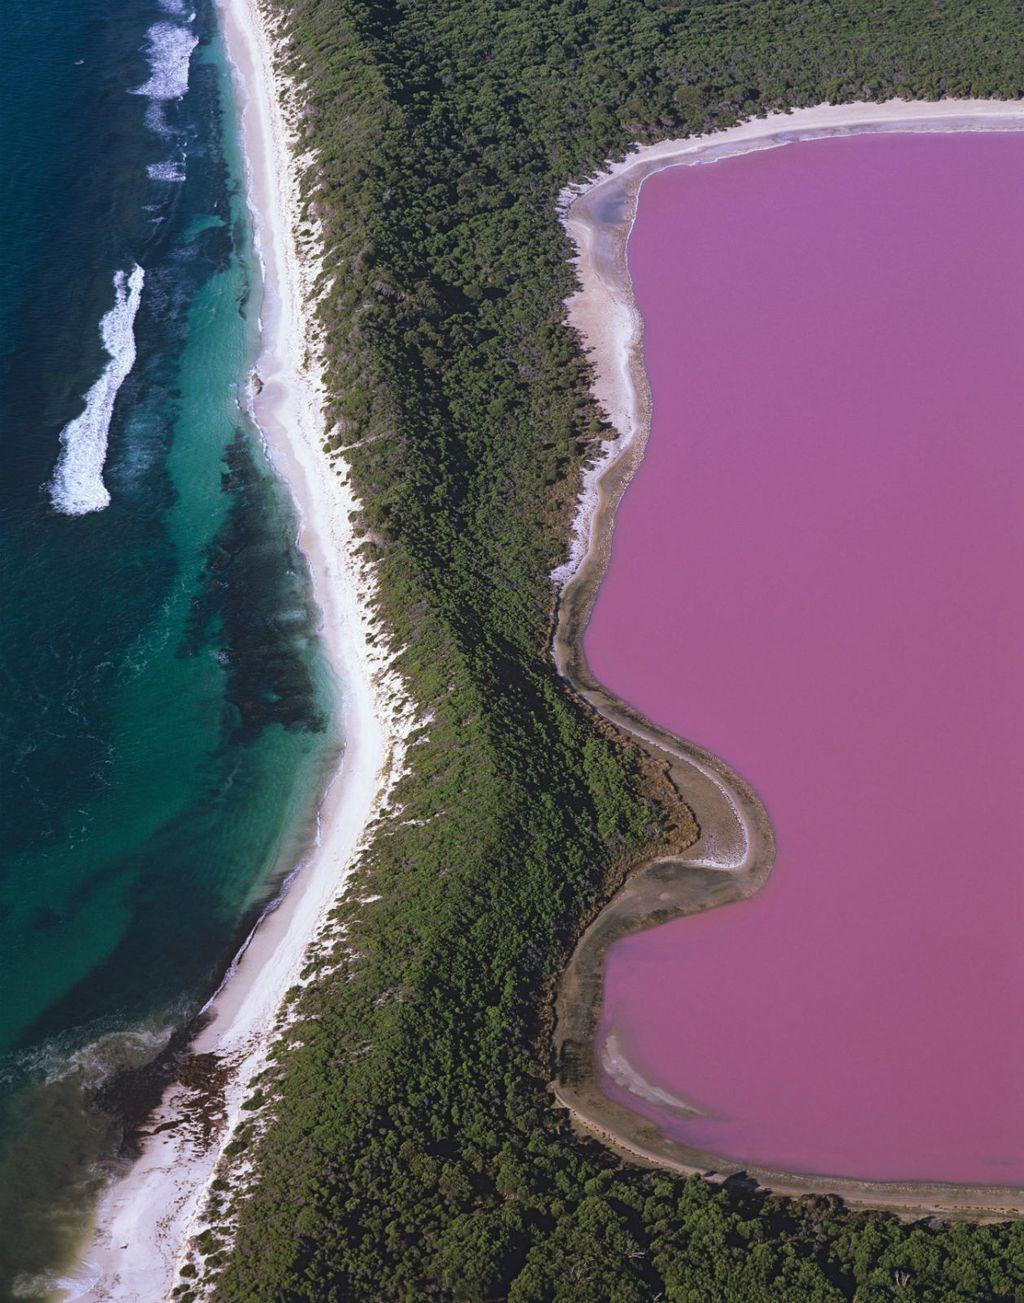 Veličanstven prizor iz zraka na jezero Hillier